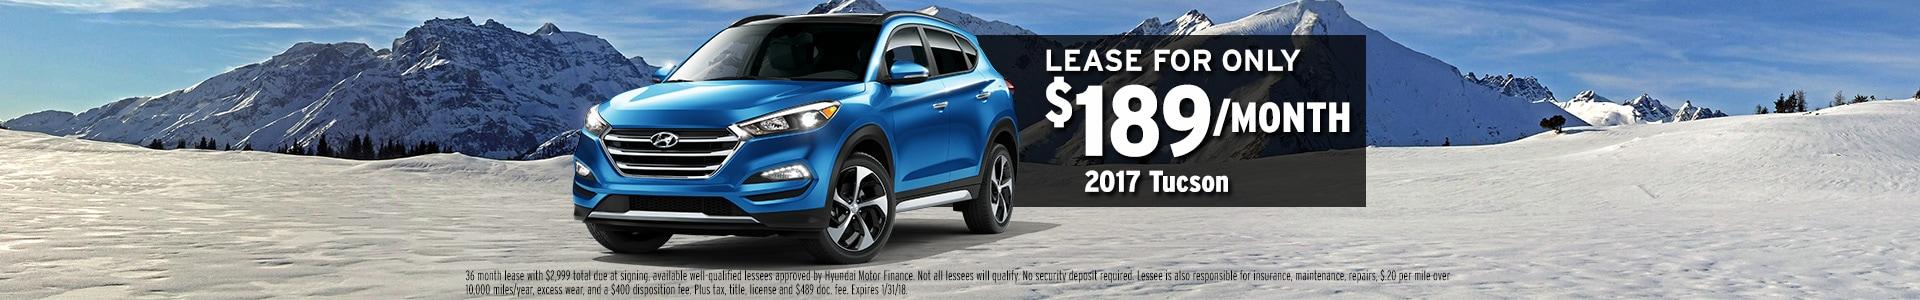 Earnhardt Hyundai North Scottsdale >> Phoenix Hyundai Dealer | Earnhardt Hyundai North Scottsdale AZ Luxury Car Sales